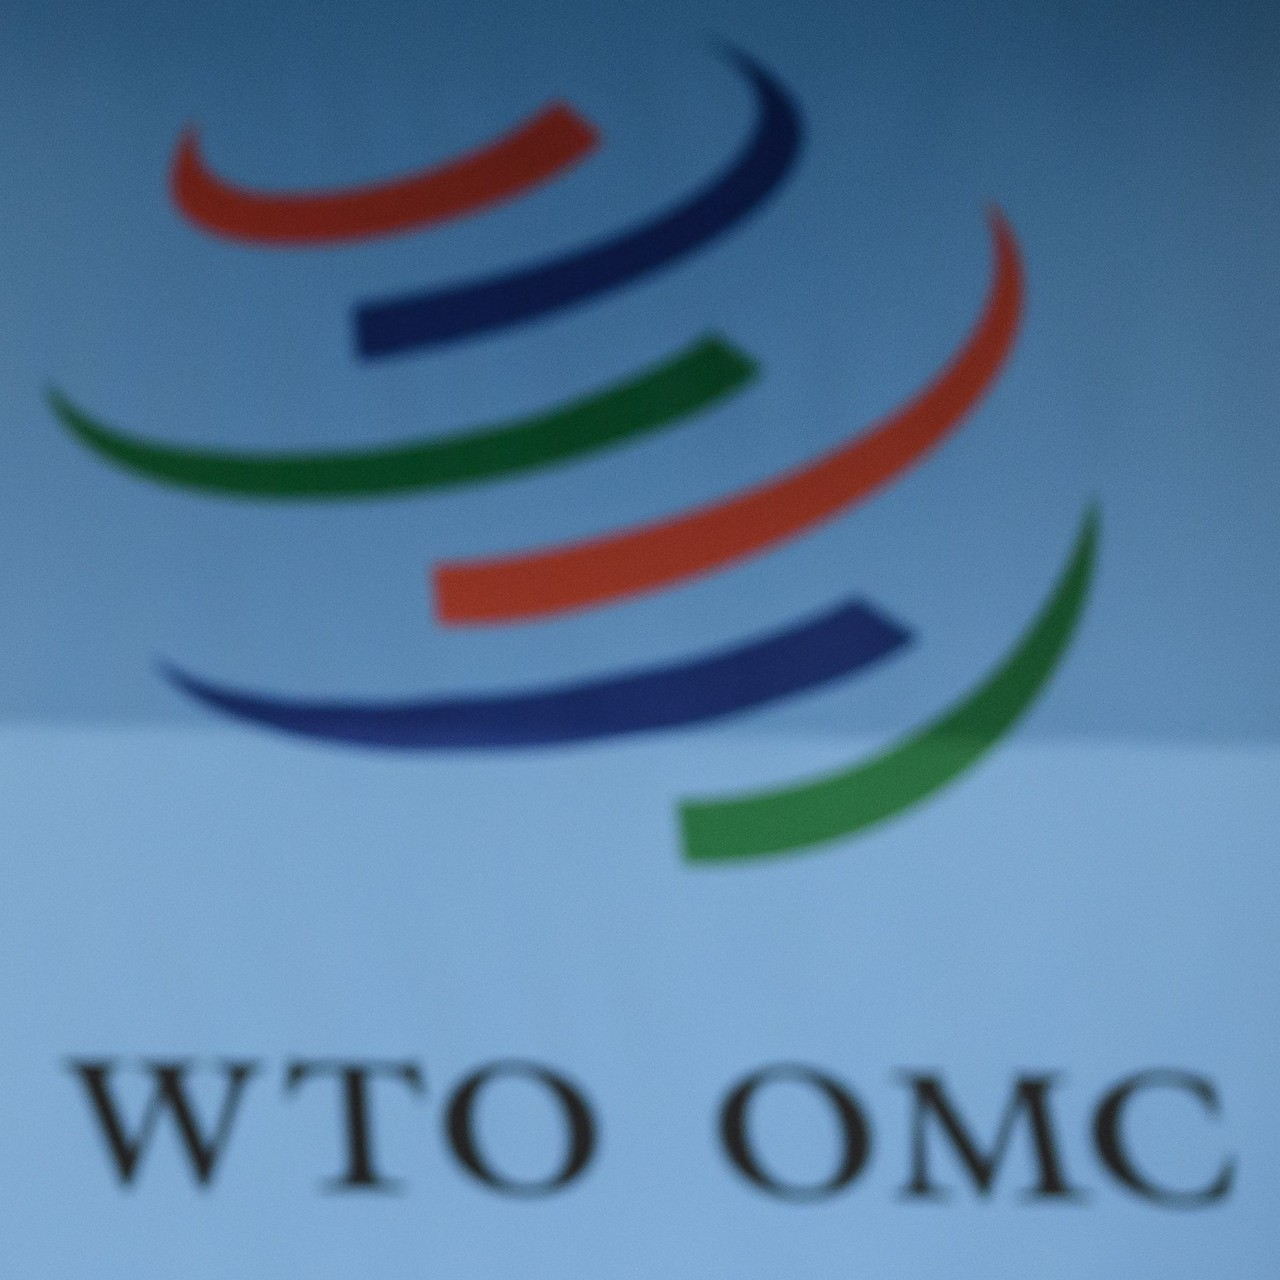 Trade war pushing Taiwanese firms back home, with reshoring